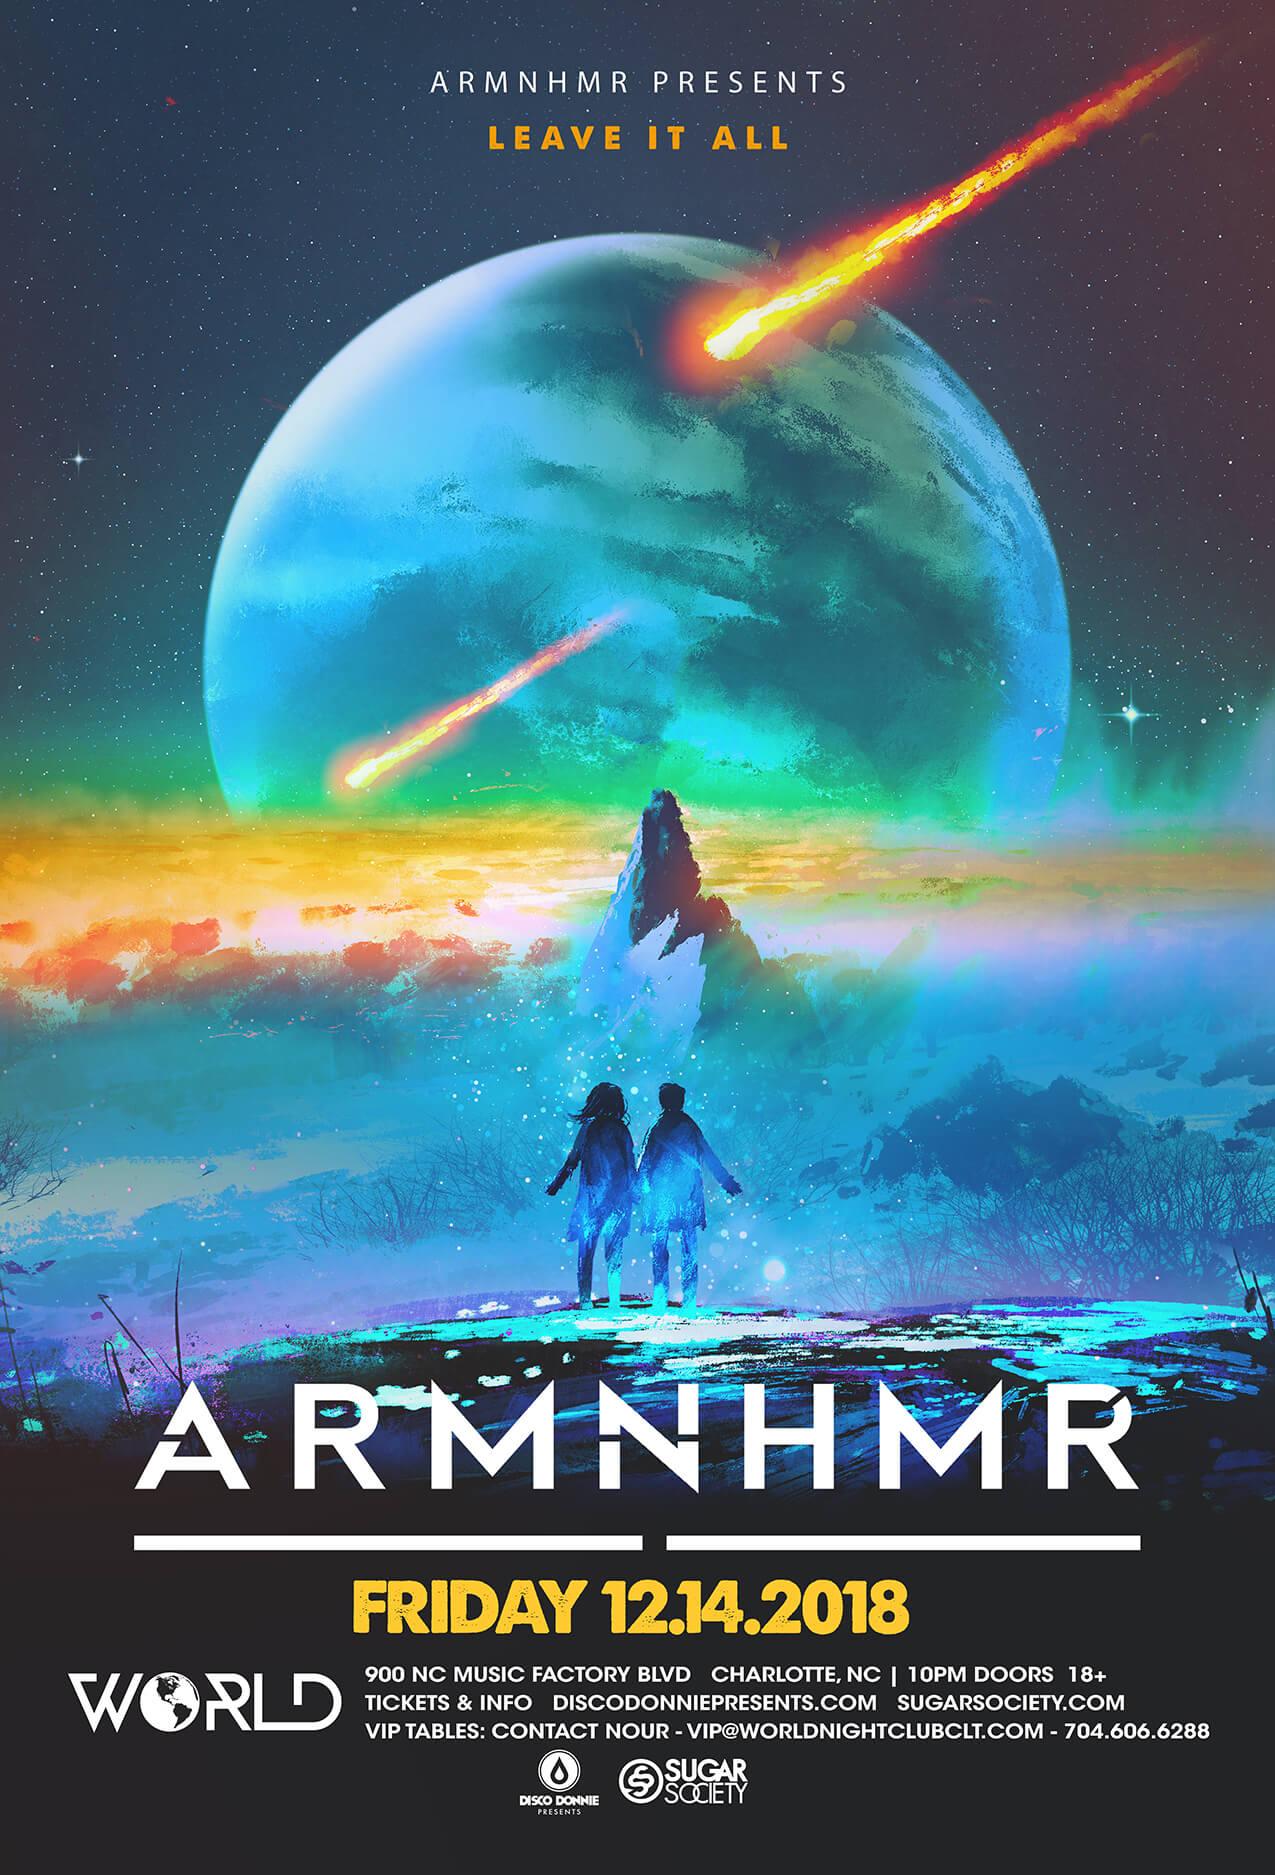 ARMNHMR in Charlotte